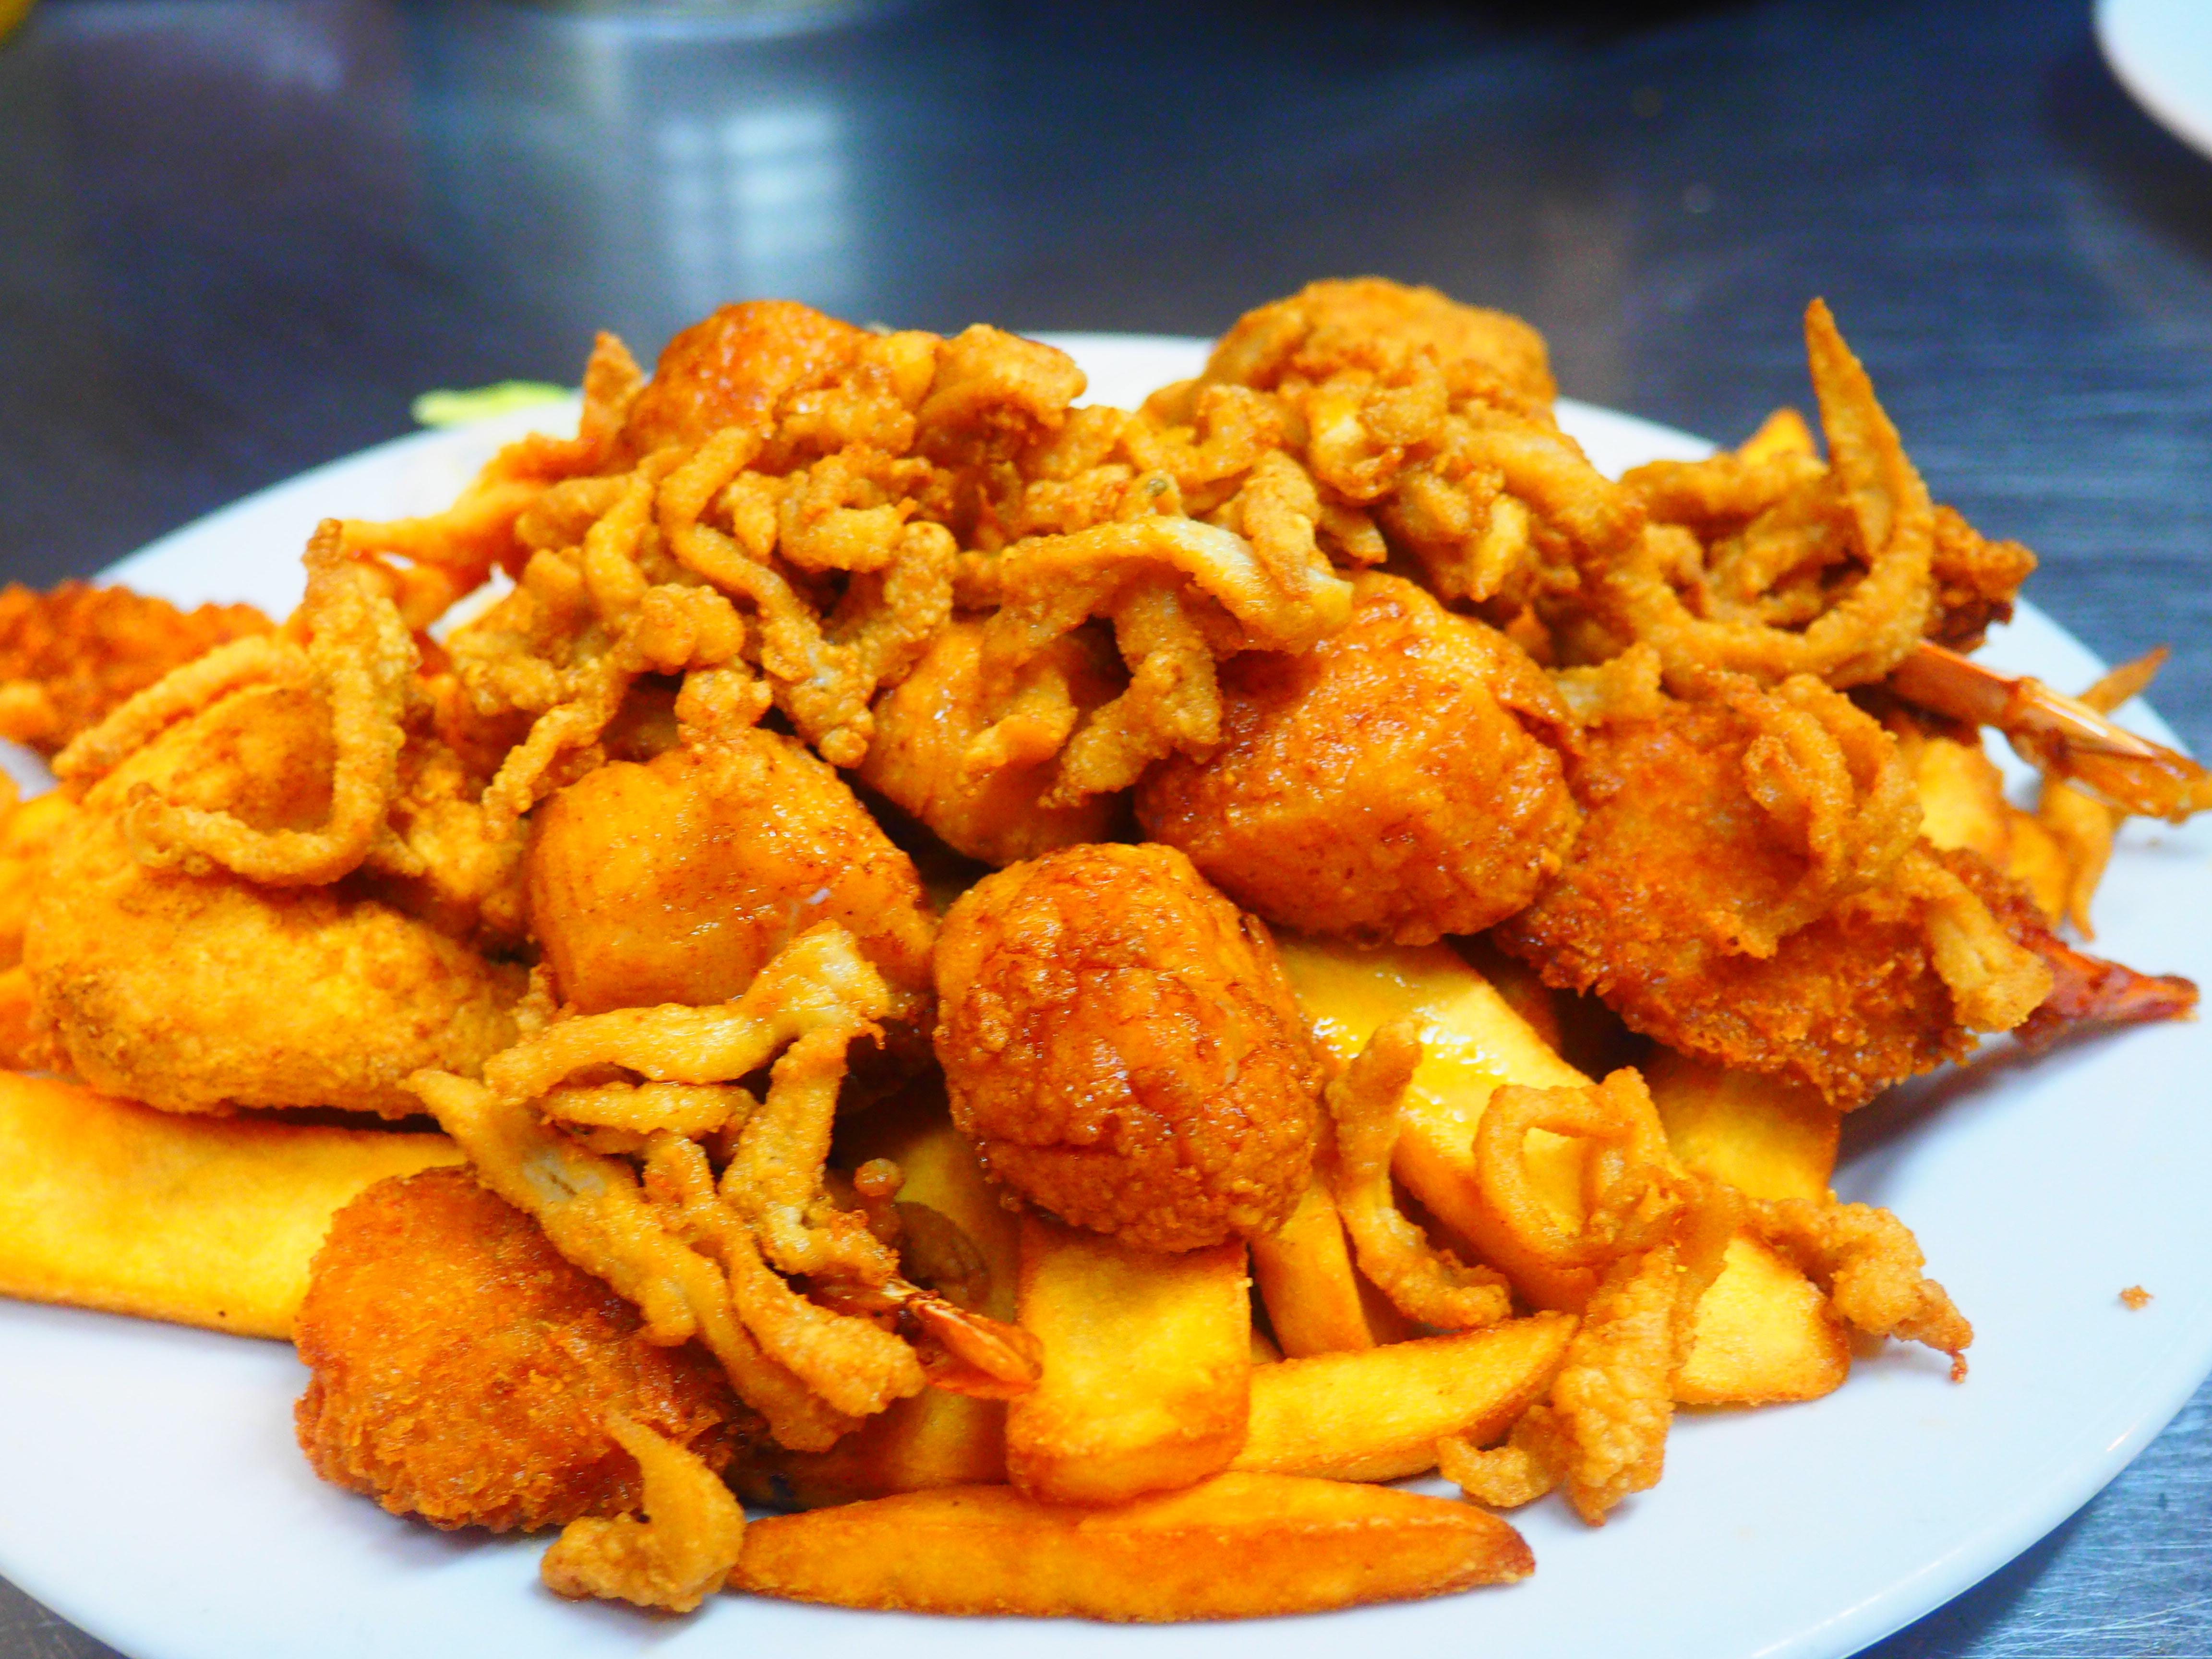 Seafood Platter Image